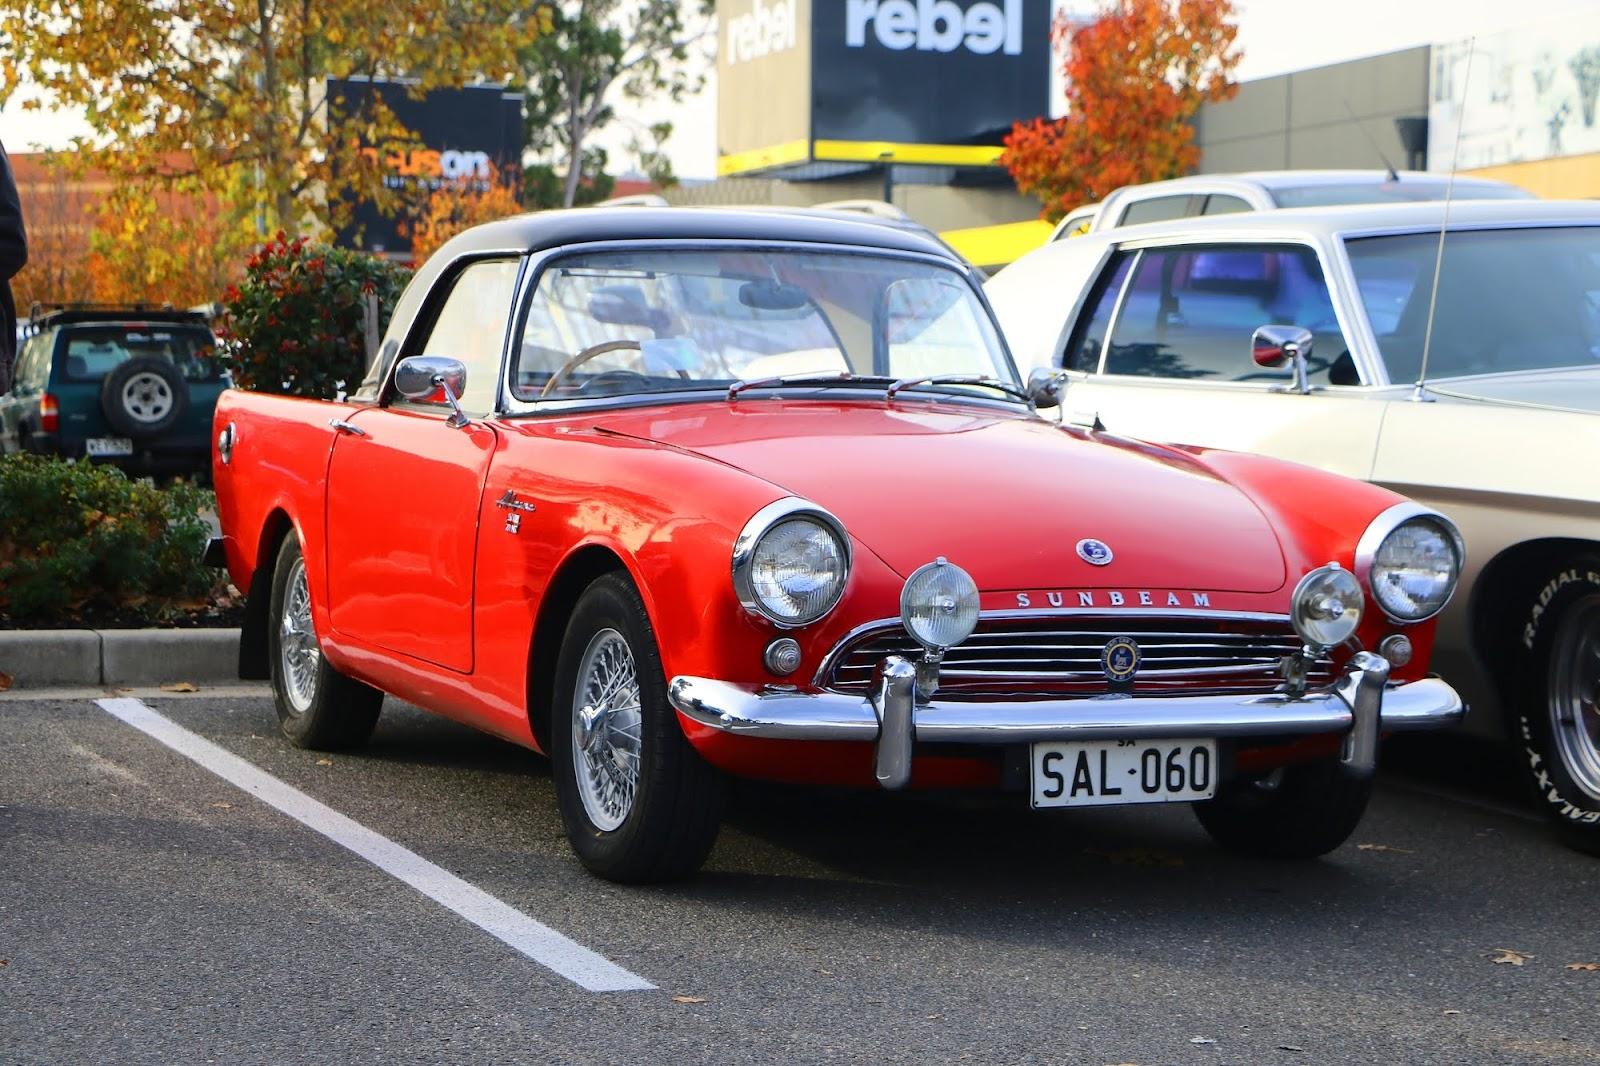 1960 Sunbeam Alpine Convertible.jpg